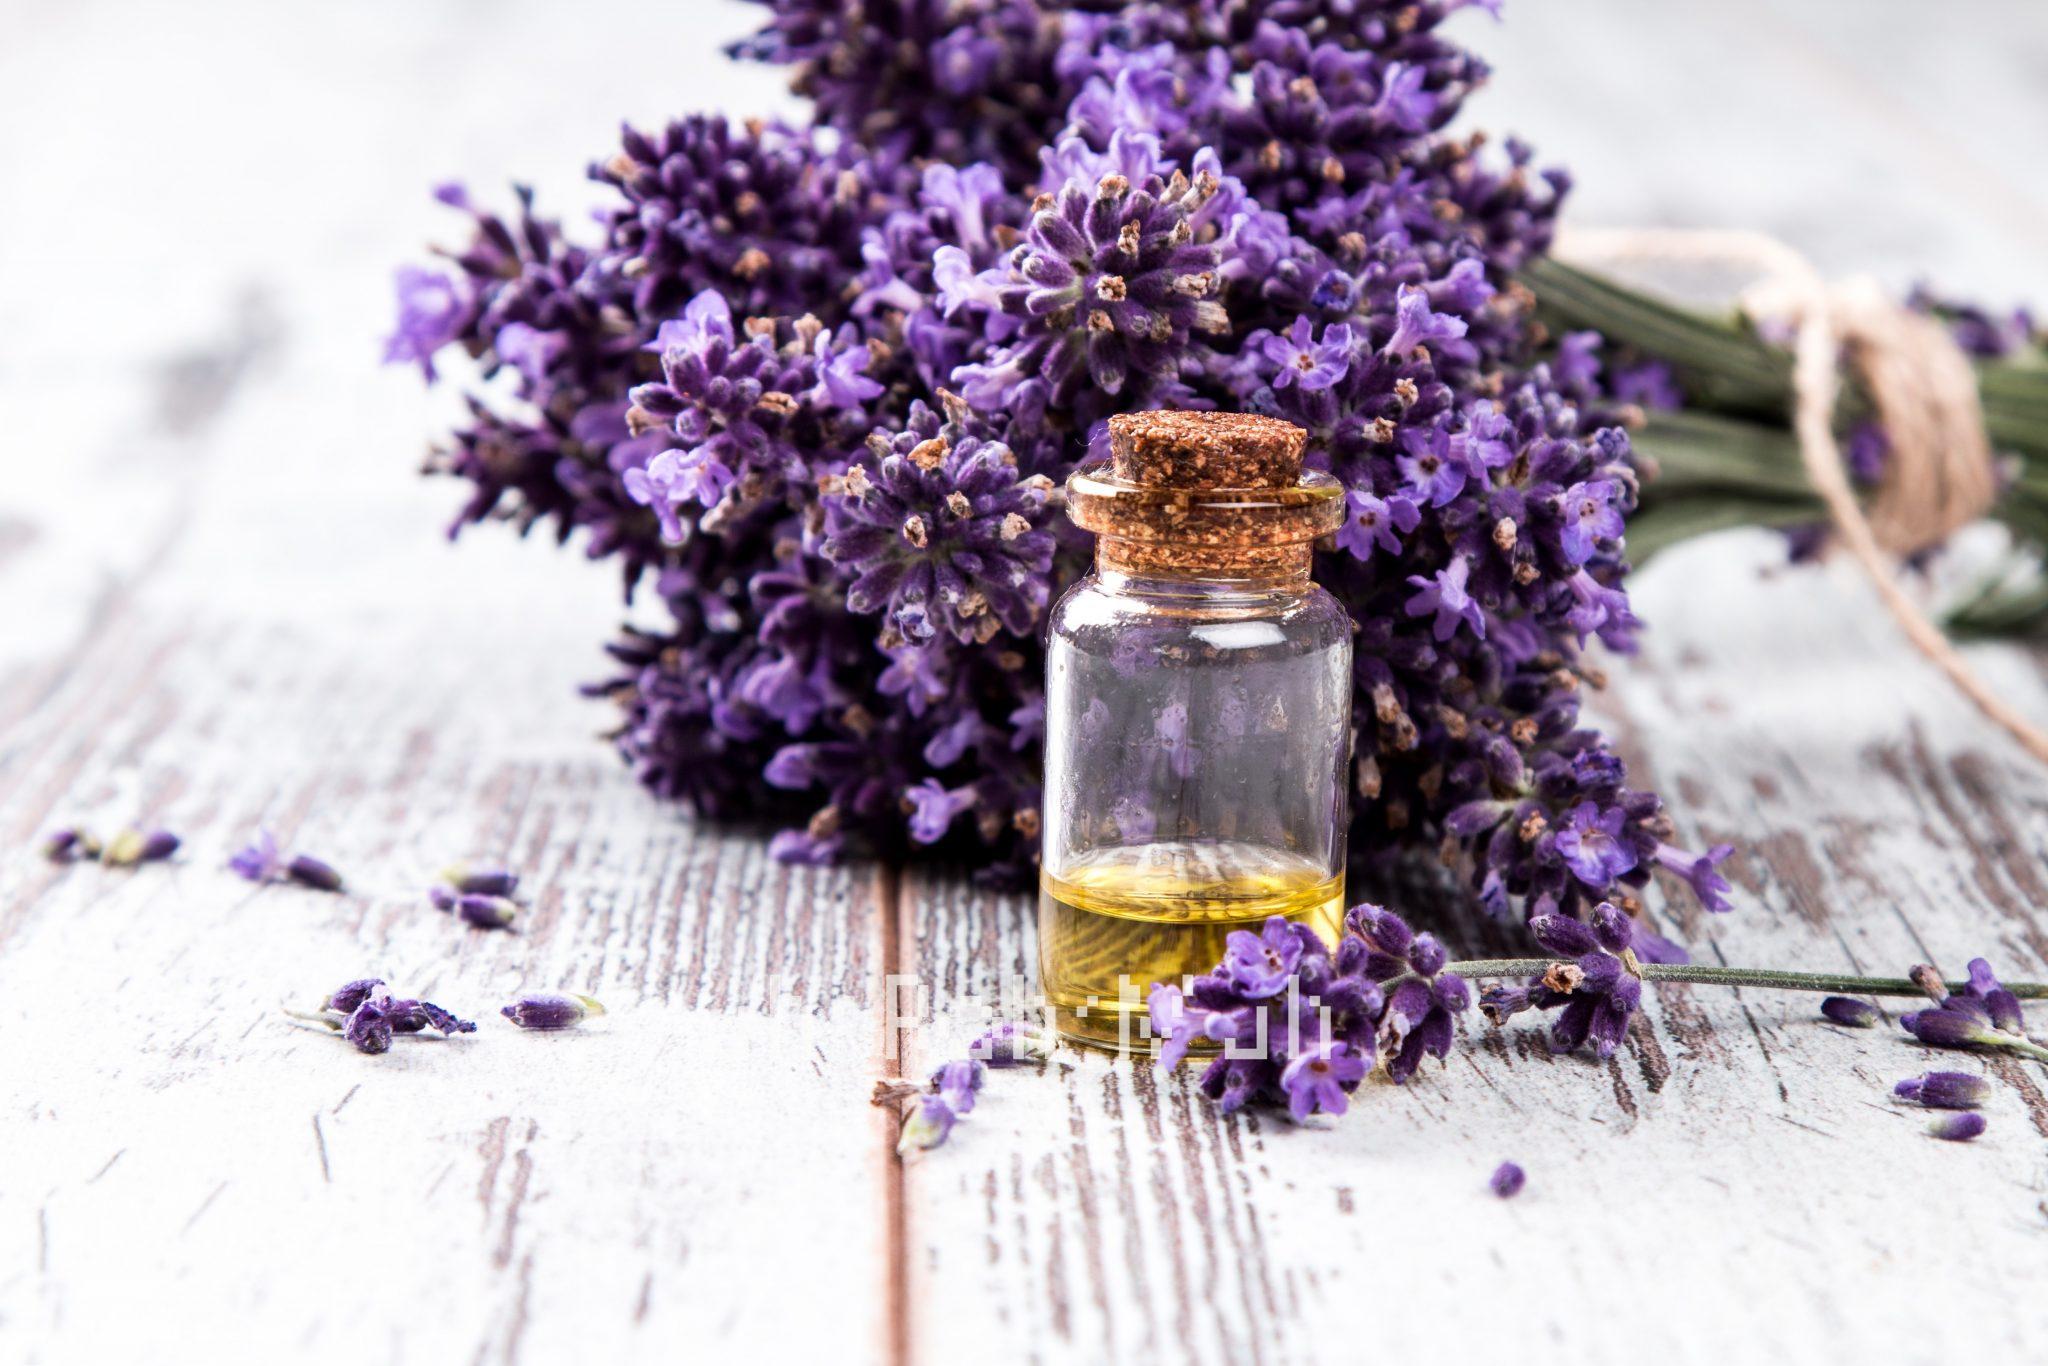 Lavender 4042 oil / Lavender 40/42